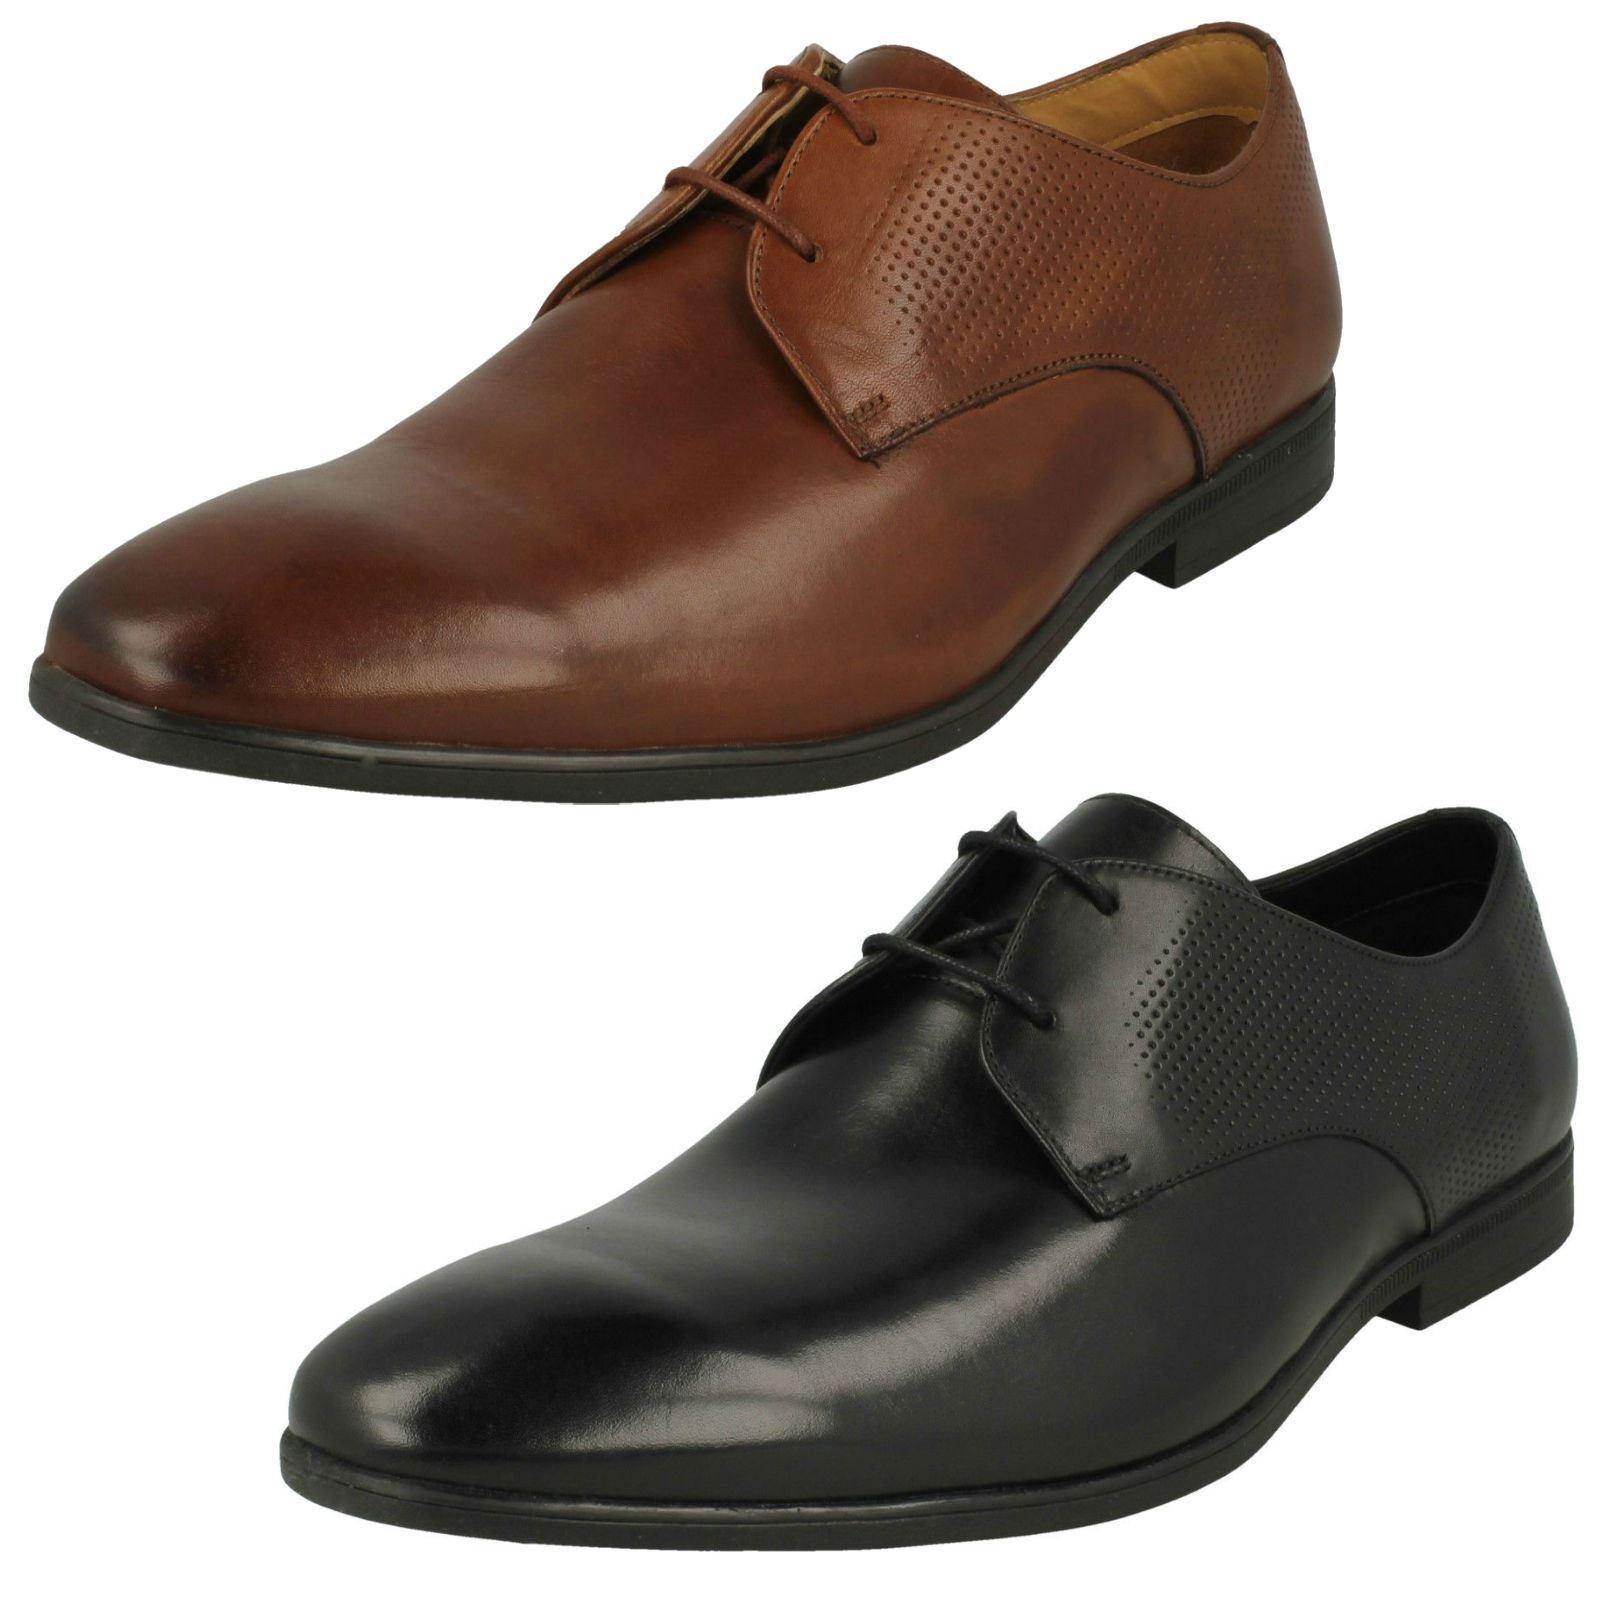 Mens Formal Lace Up Shoes - Bampton Walk